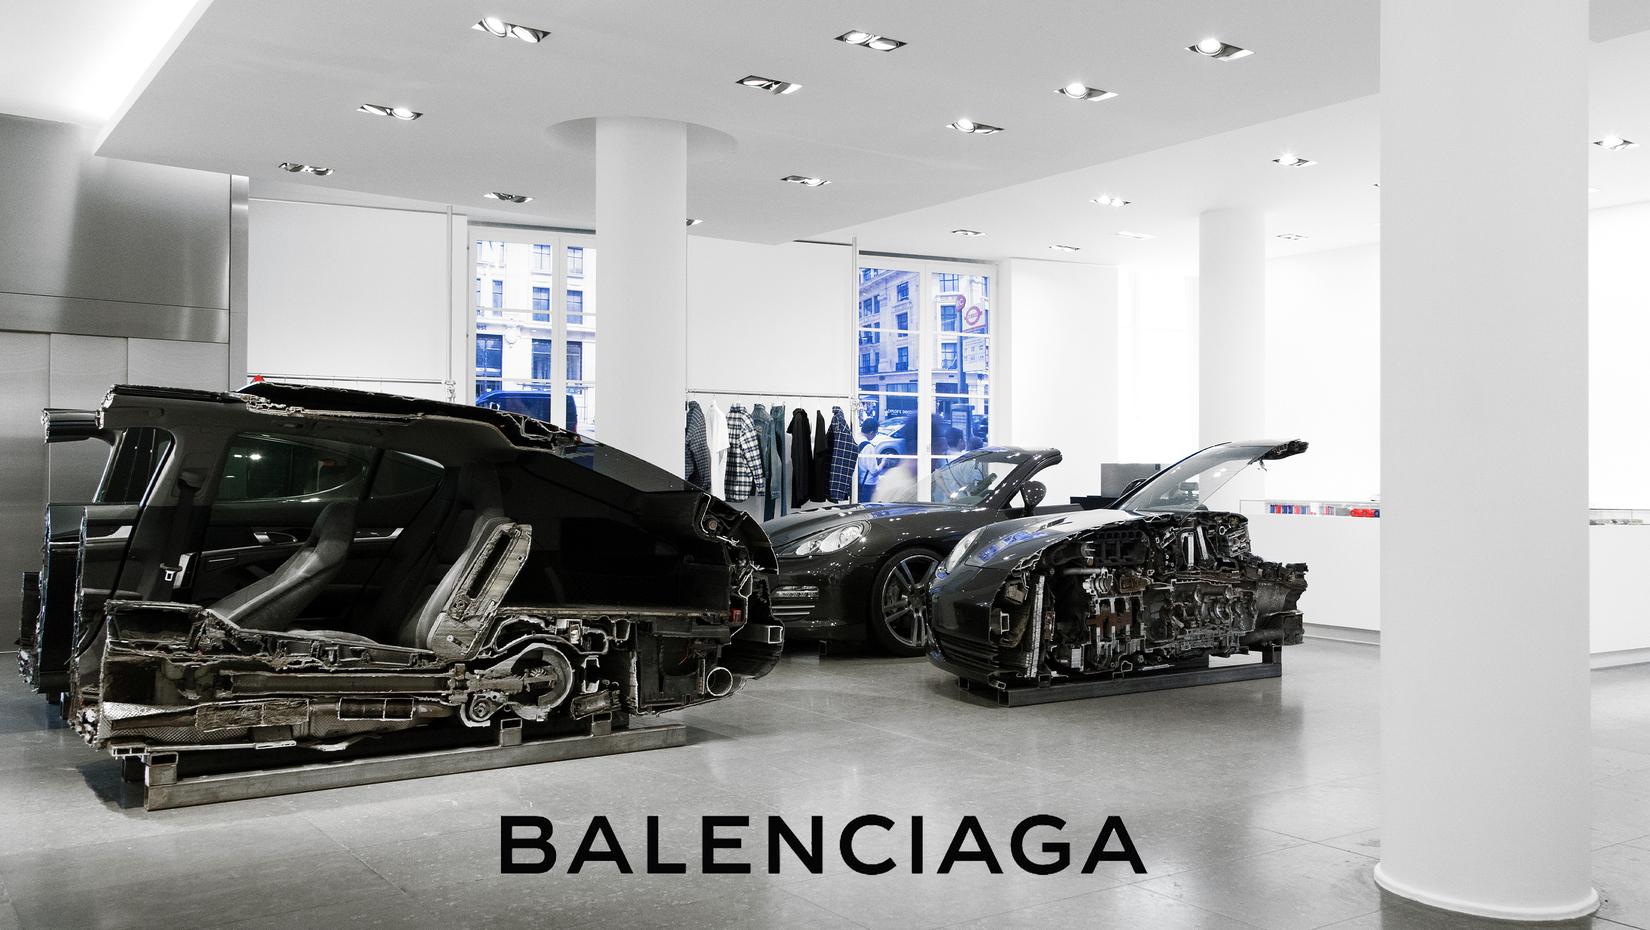 Balenciaga x Colette